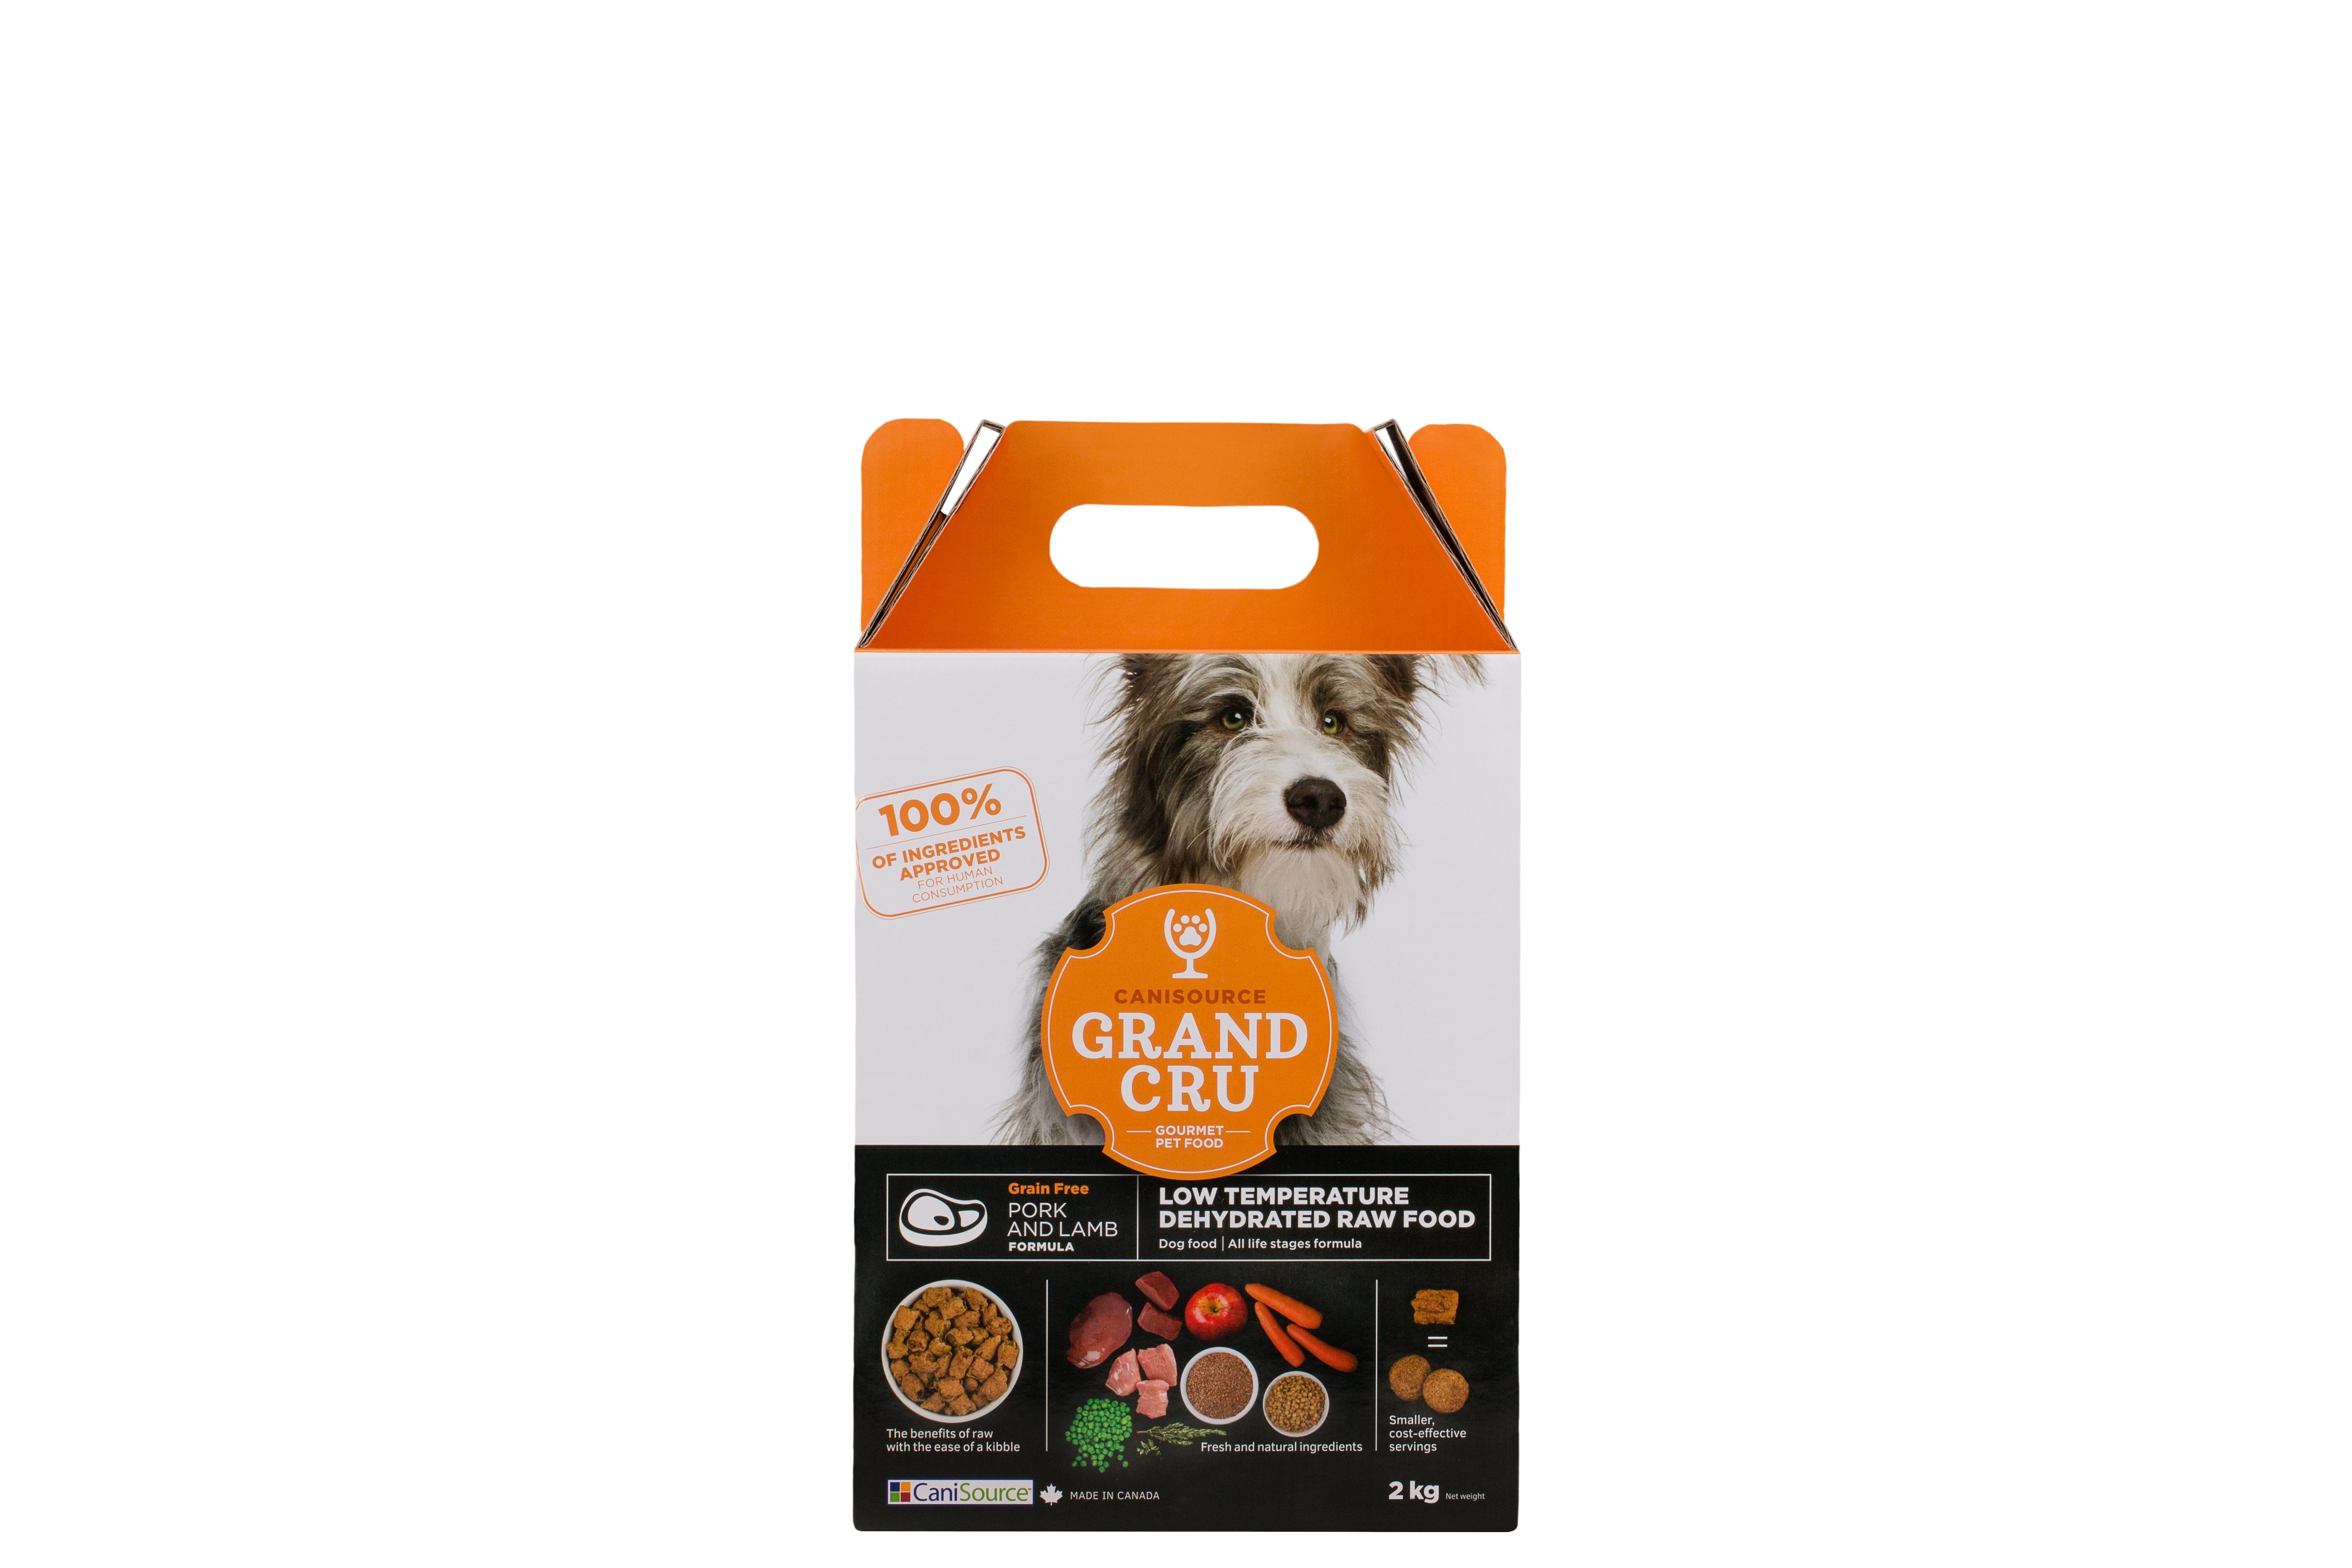 CaniSource Grand Cru Pork & Lamb Formula Grain-Free Dehydrated Dog Food, 2-kg